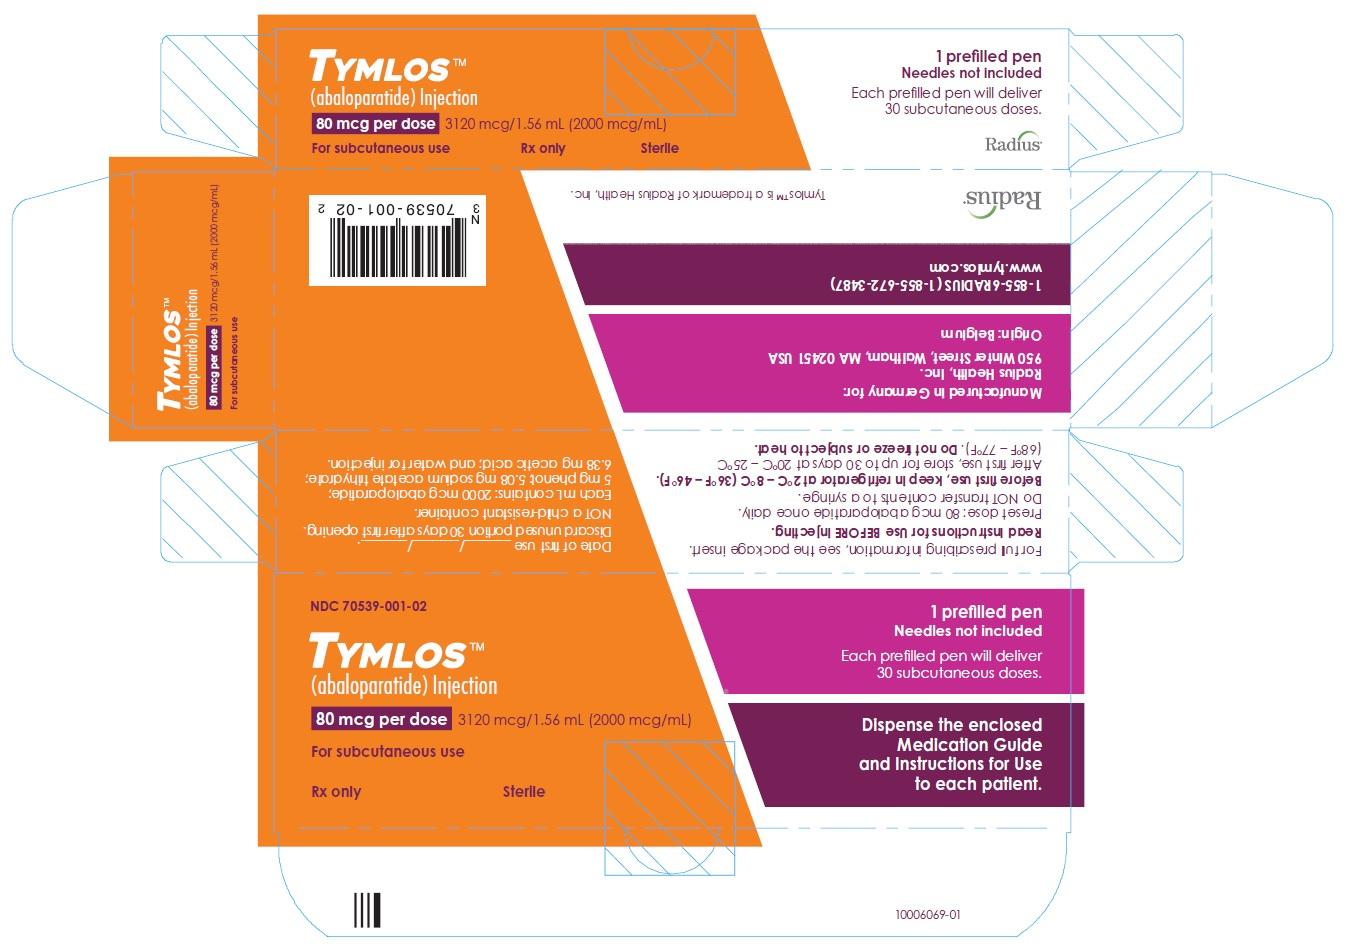 80 mcg Carton Label